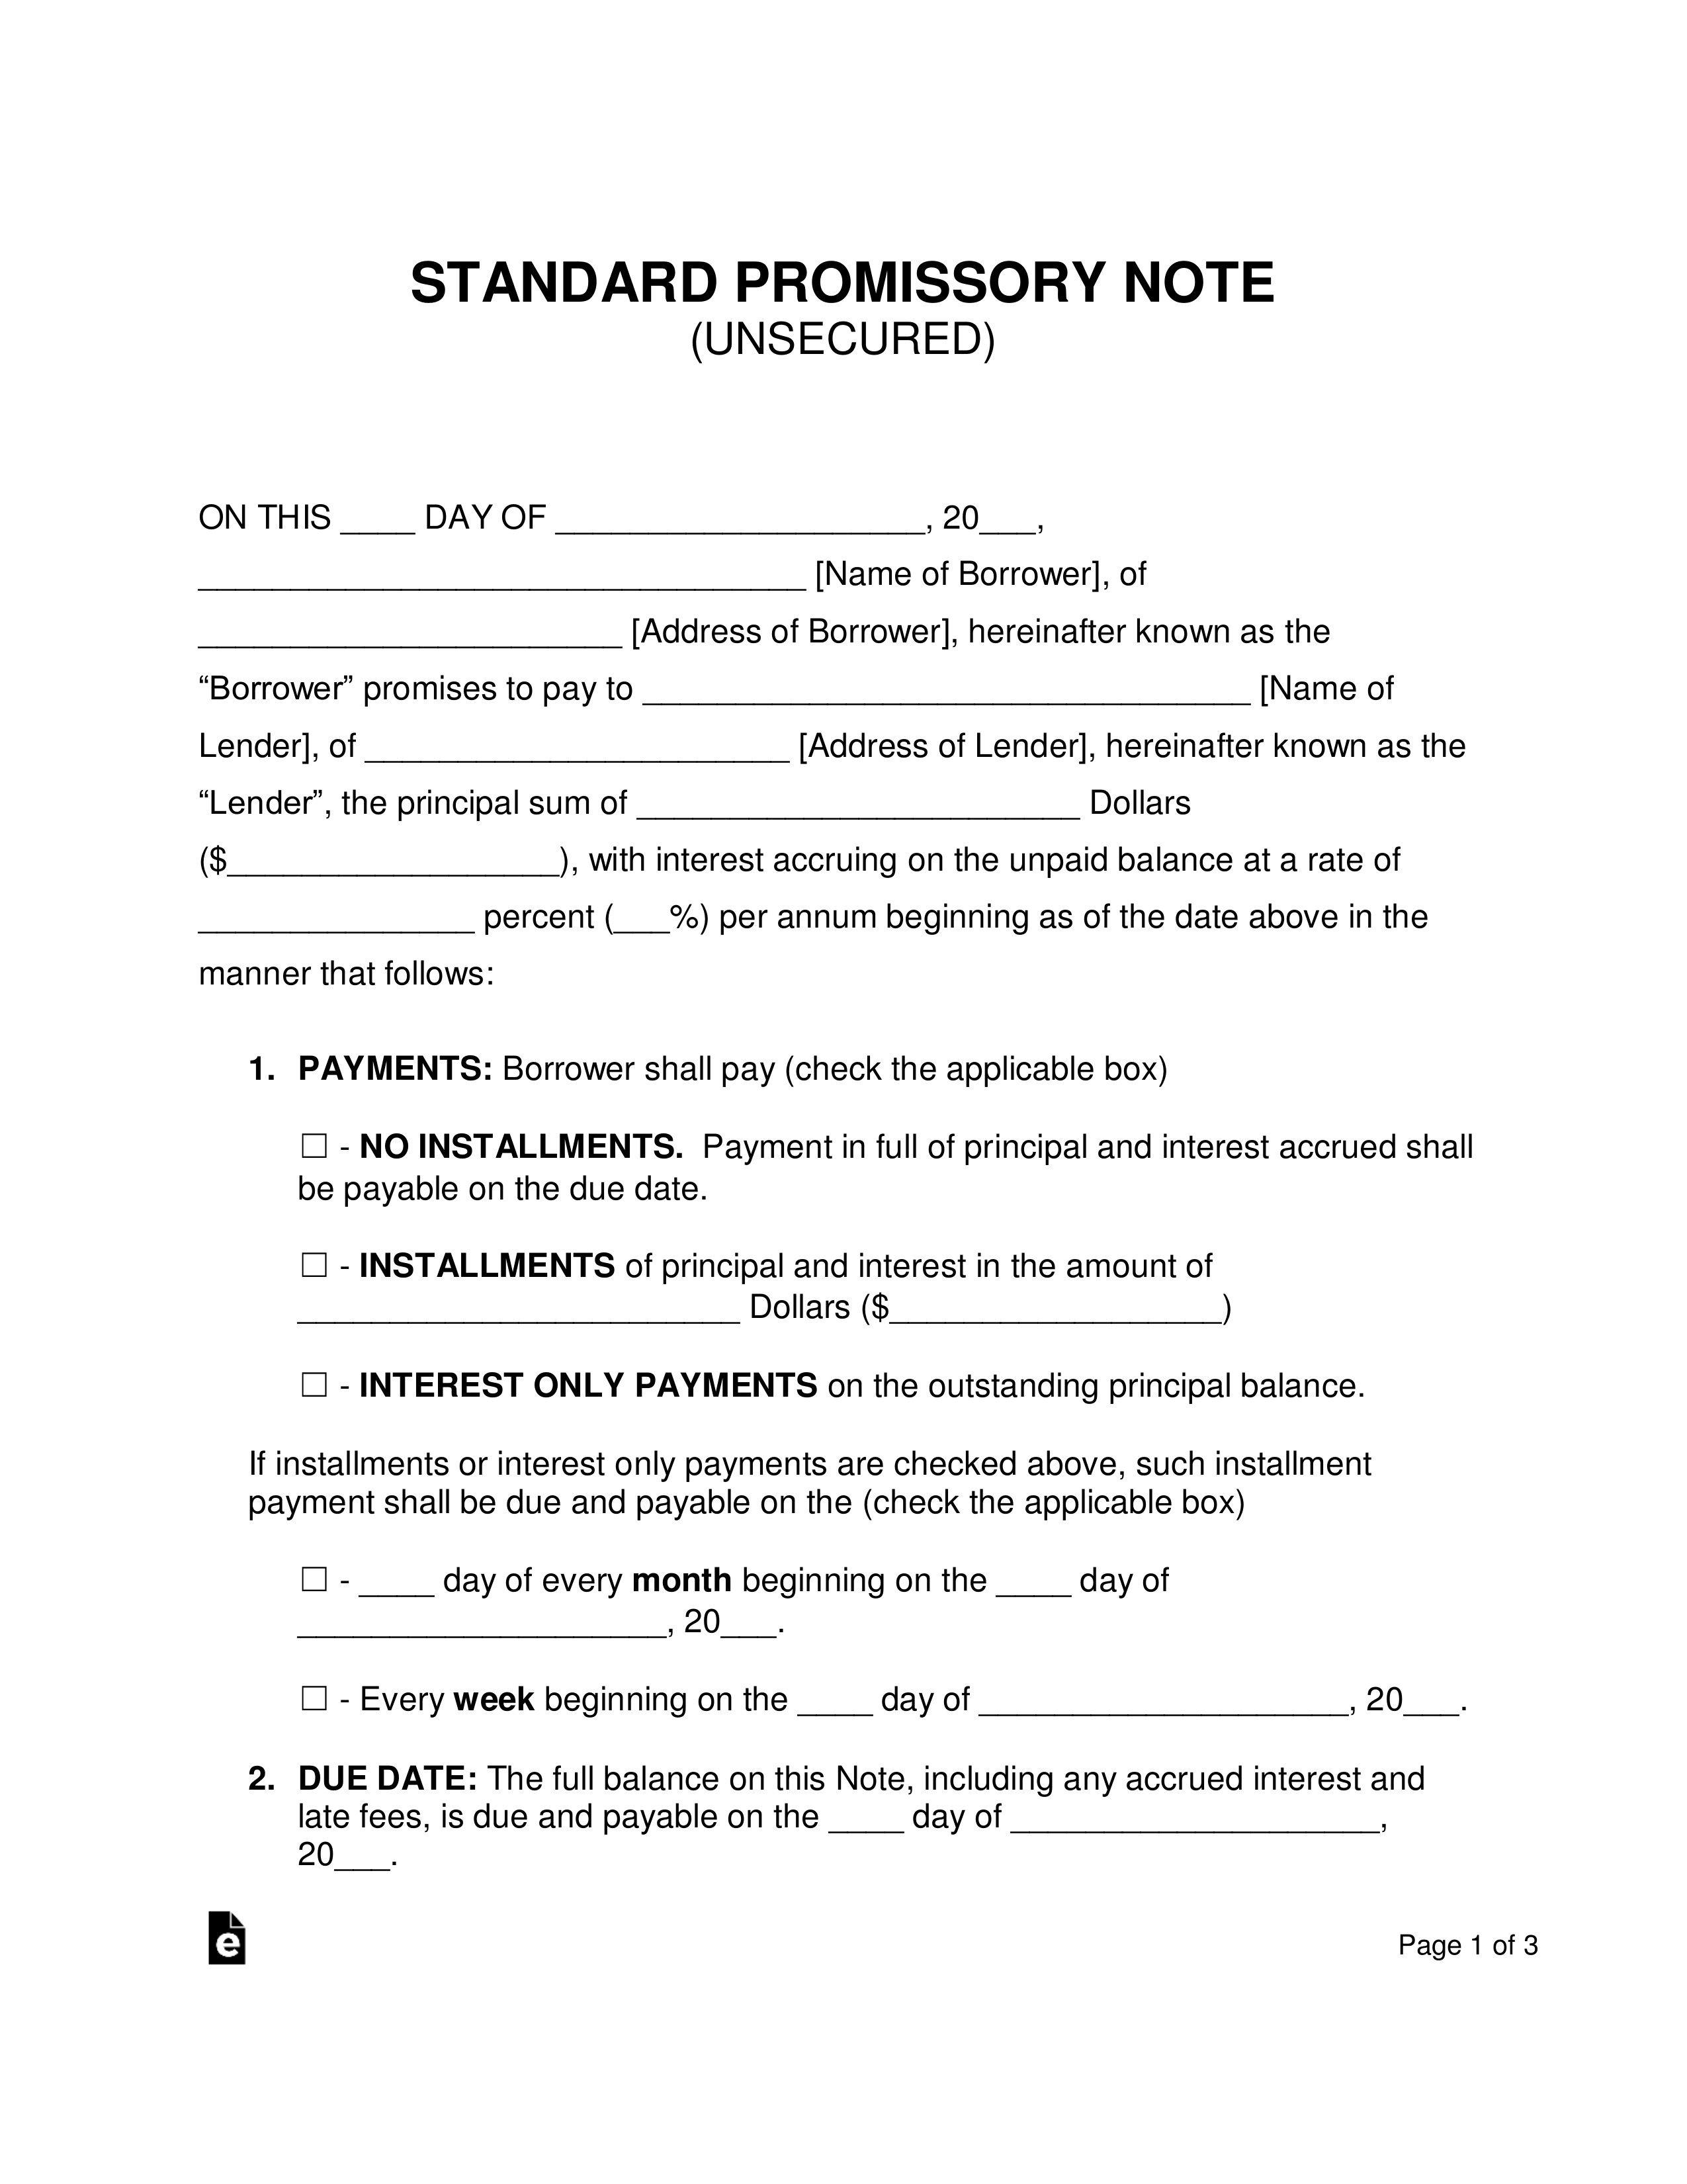 008 Sensational Promissory Note Template Word Image  Document Uk Sample In FormatFull